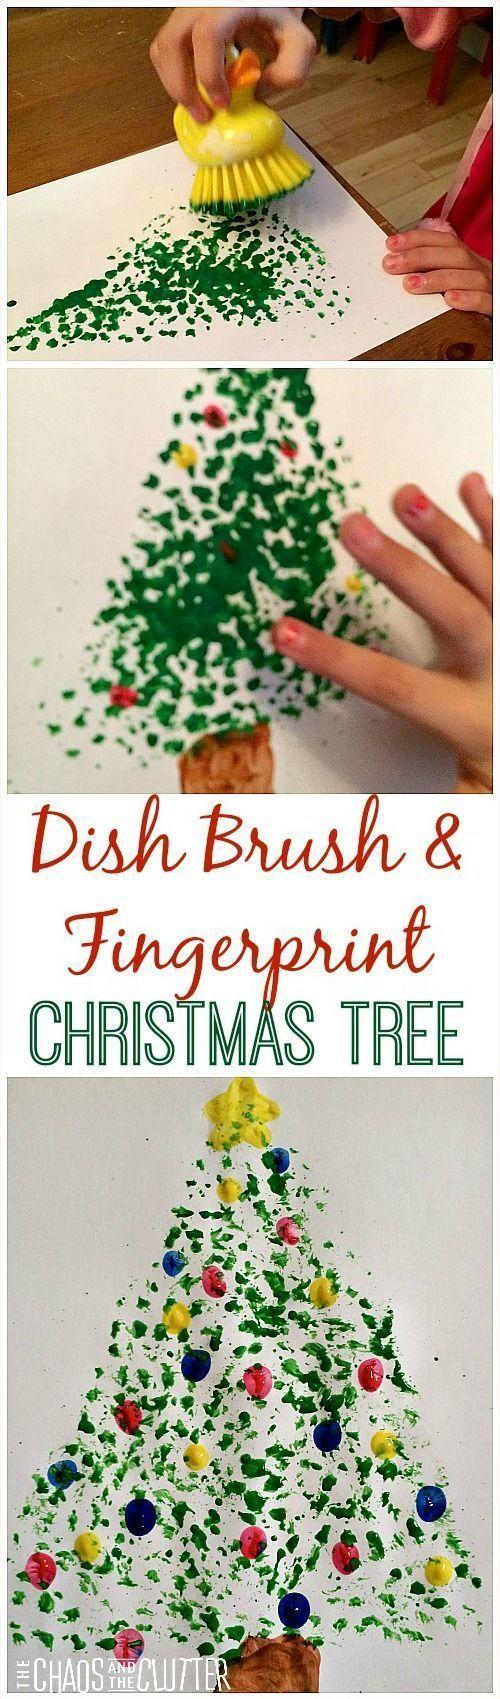 Dish Brush and Fingerprint Painted Christmas Tree #craft for #kids. #christmas